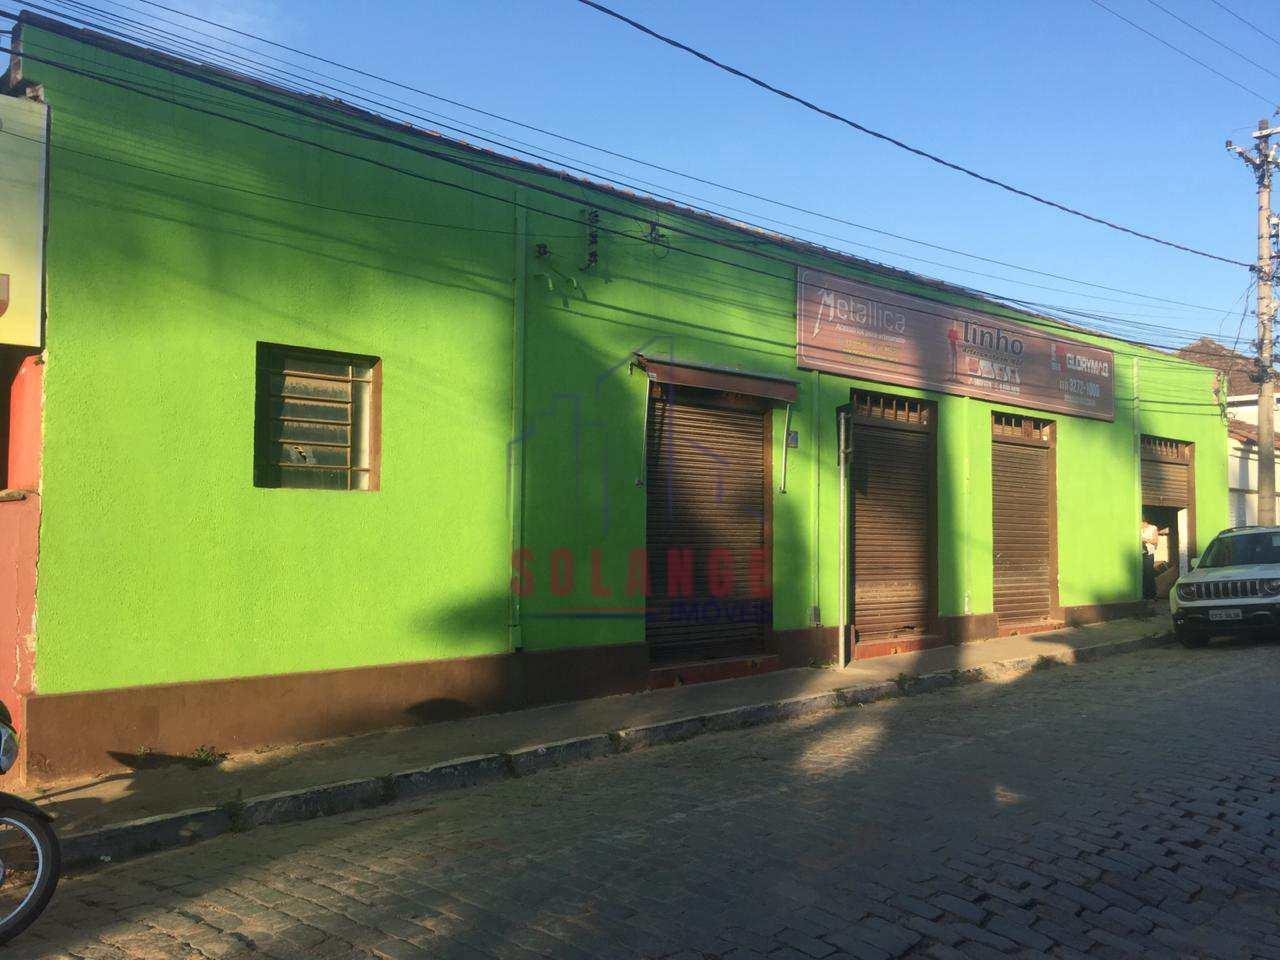 Armazém/Barracão, Centro (Arcadas), Amparo - R$ 700 mil, Cod: 2210